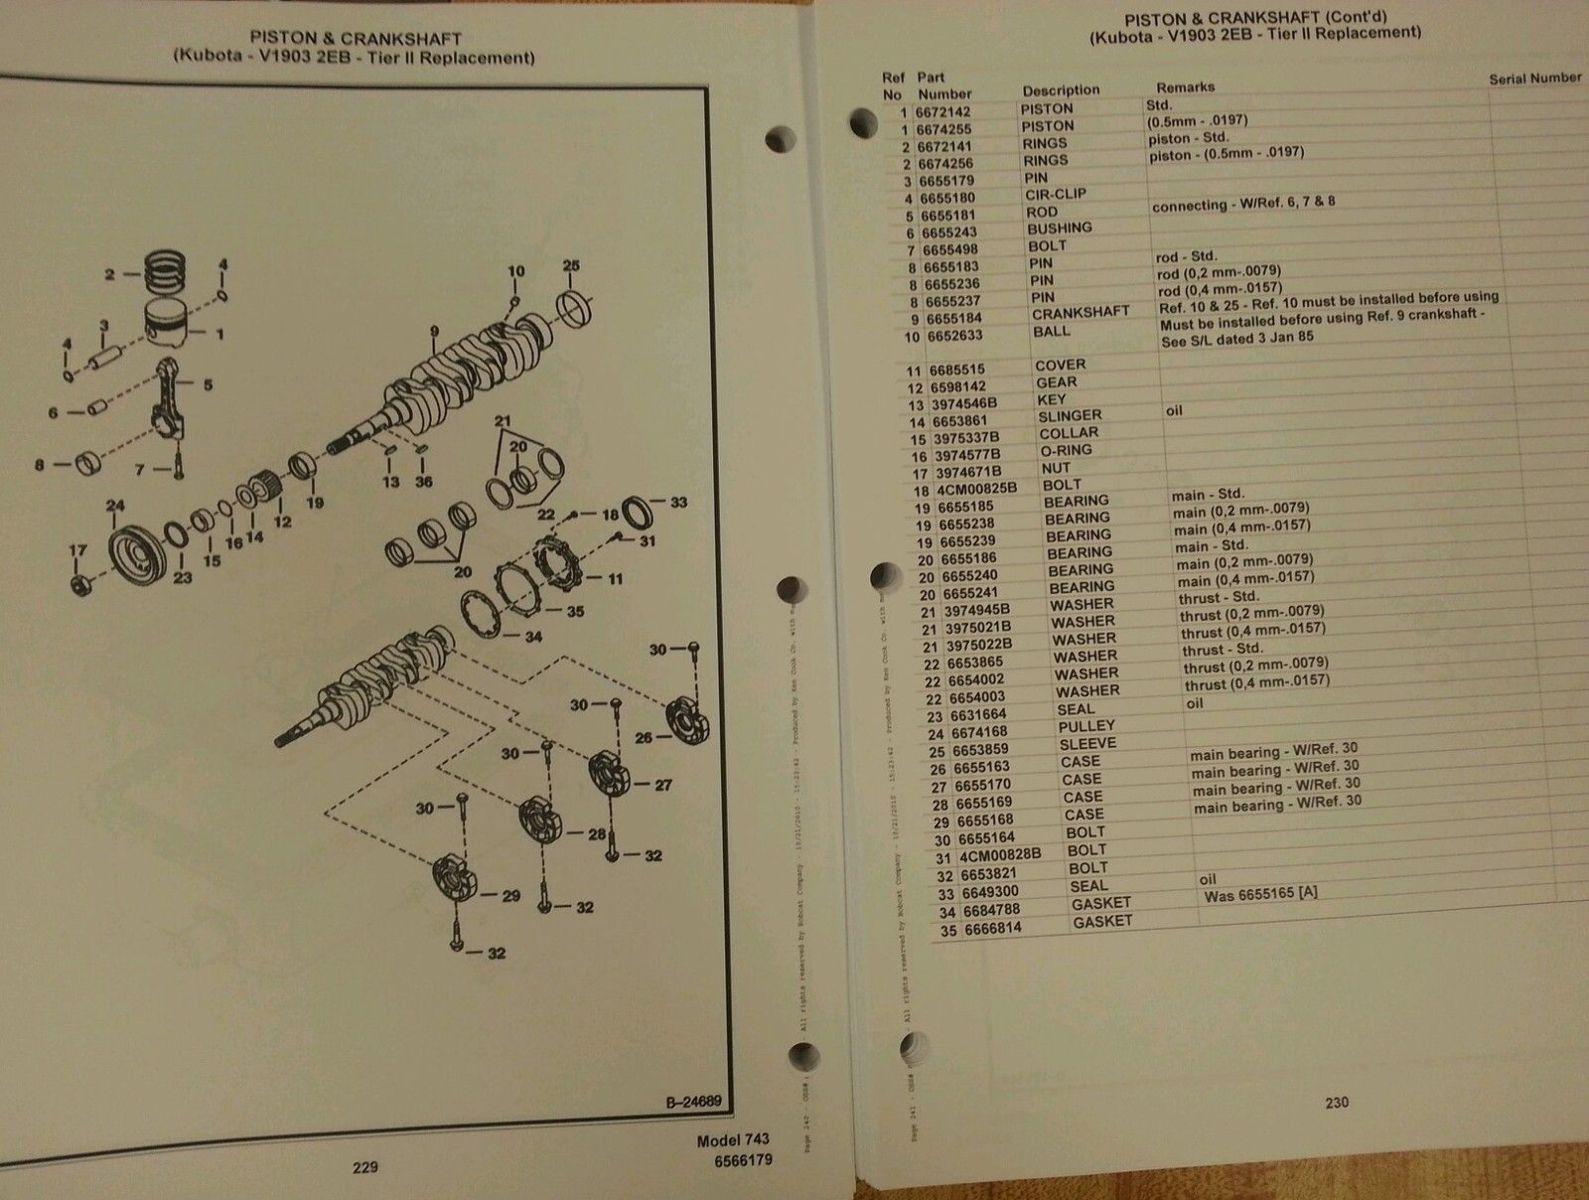 bobcat 743 early parts manual book skid steer loader 6566179 rh finneyparts us bobcat 743 parts manual pdf Bobcat Hydraulic Pump Diagram